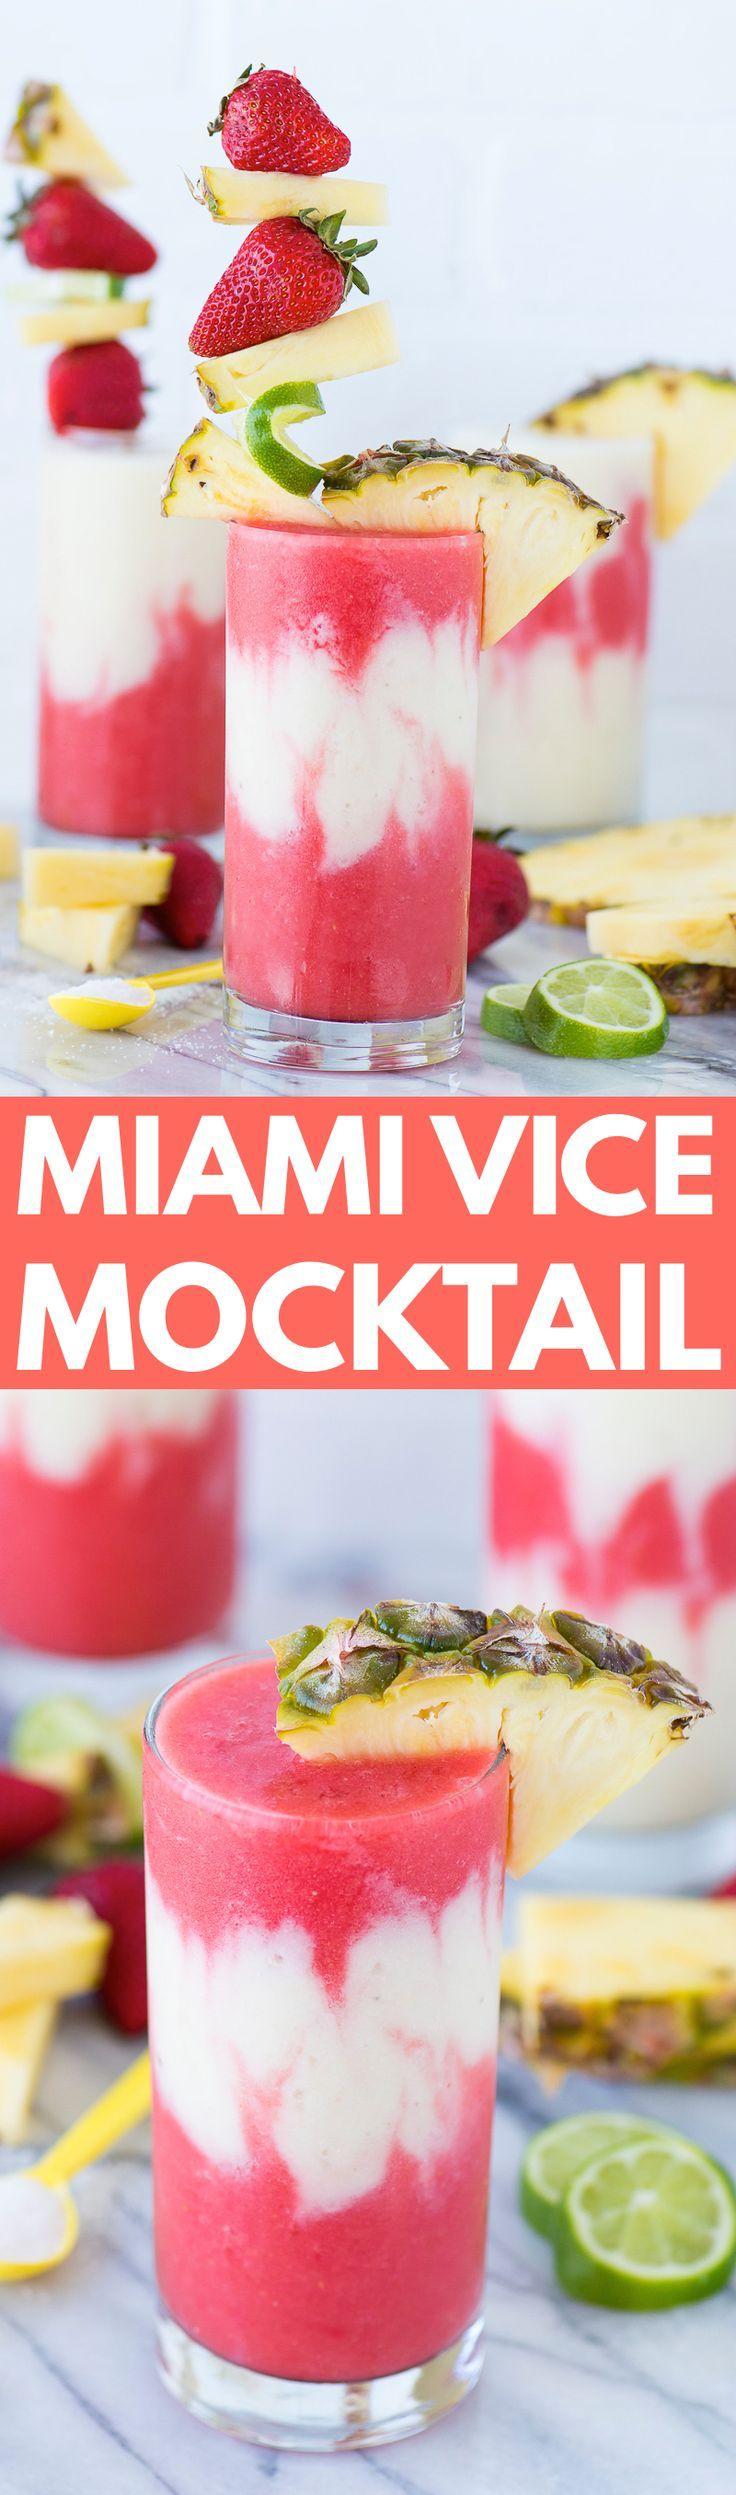 The best miami vice mocktail! Half strawberry daiquiri half pina colada layered in one glass. A tropical non-alcoholic lava flow!